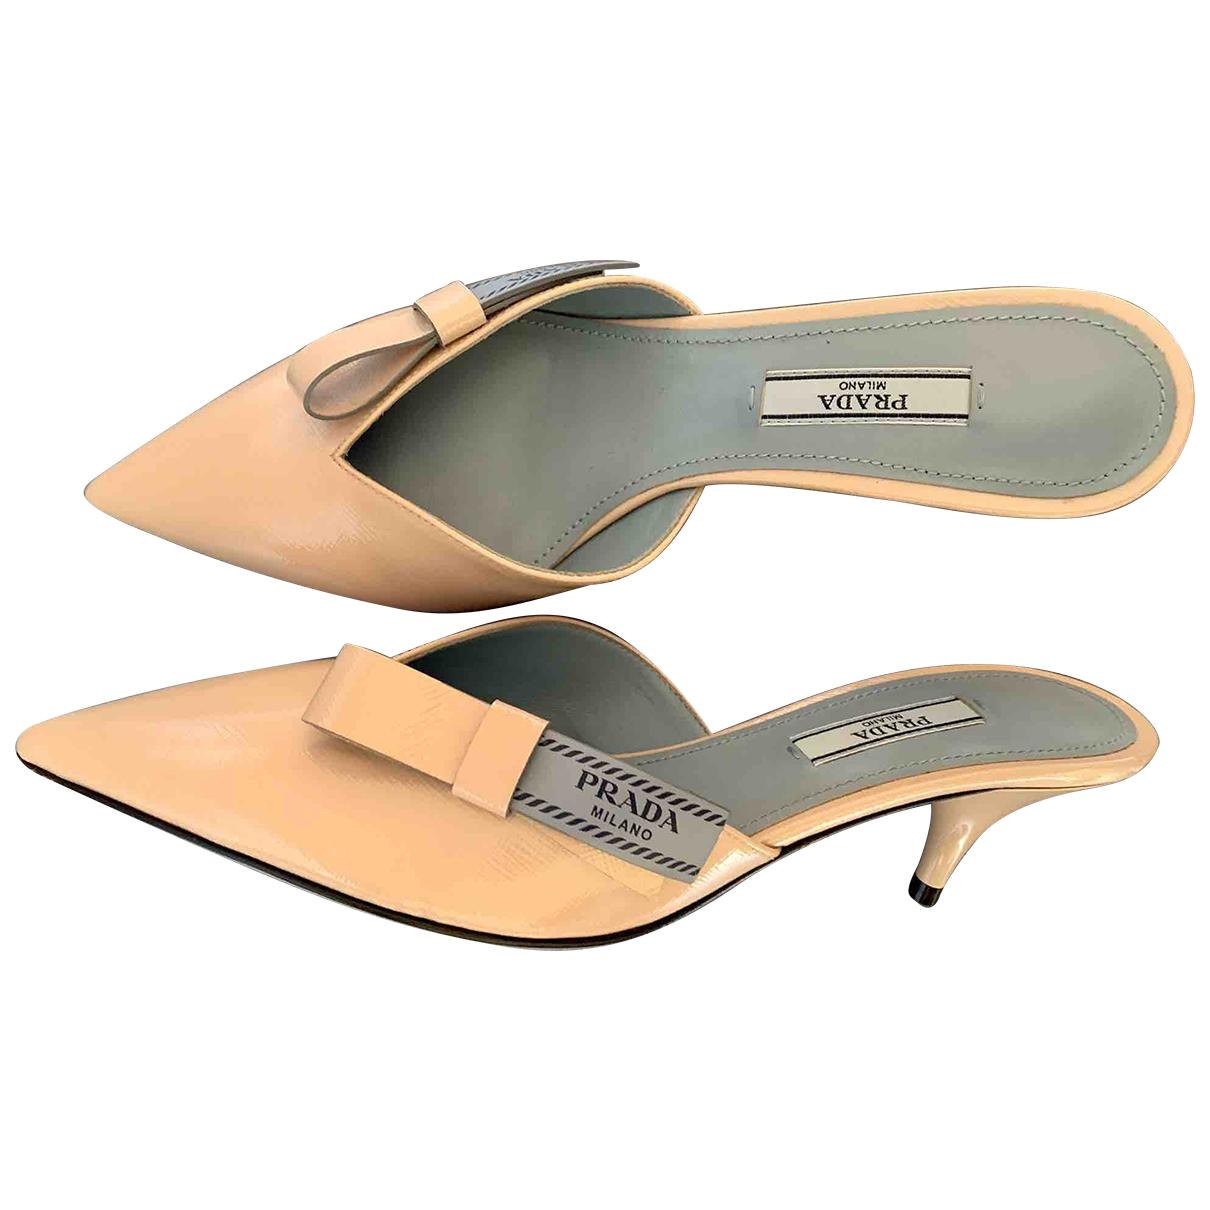 Prada - Sandales   pour femme en cuir verni - beige